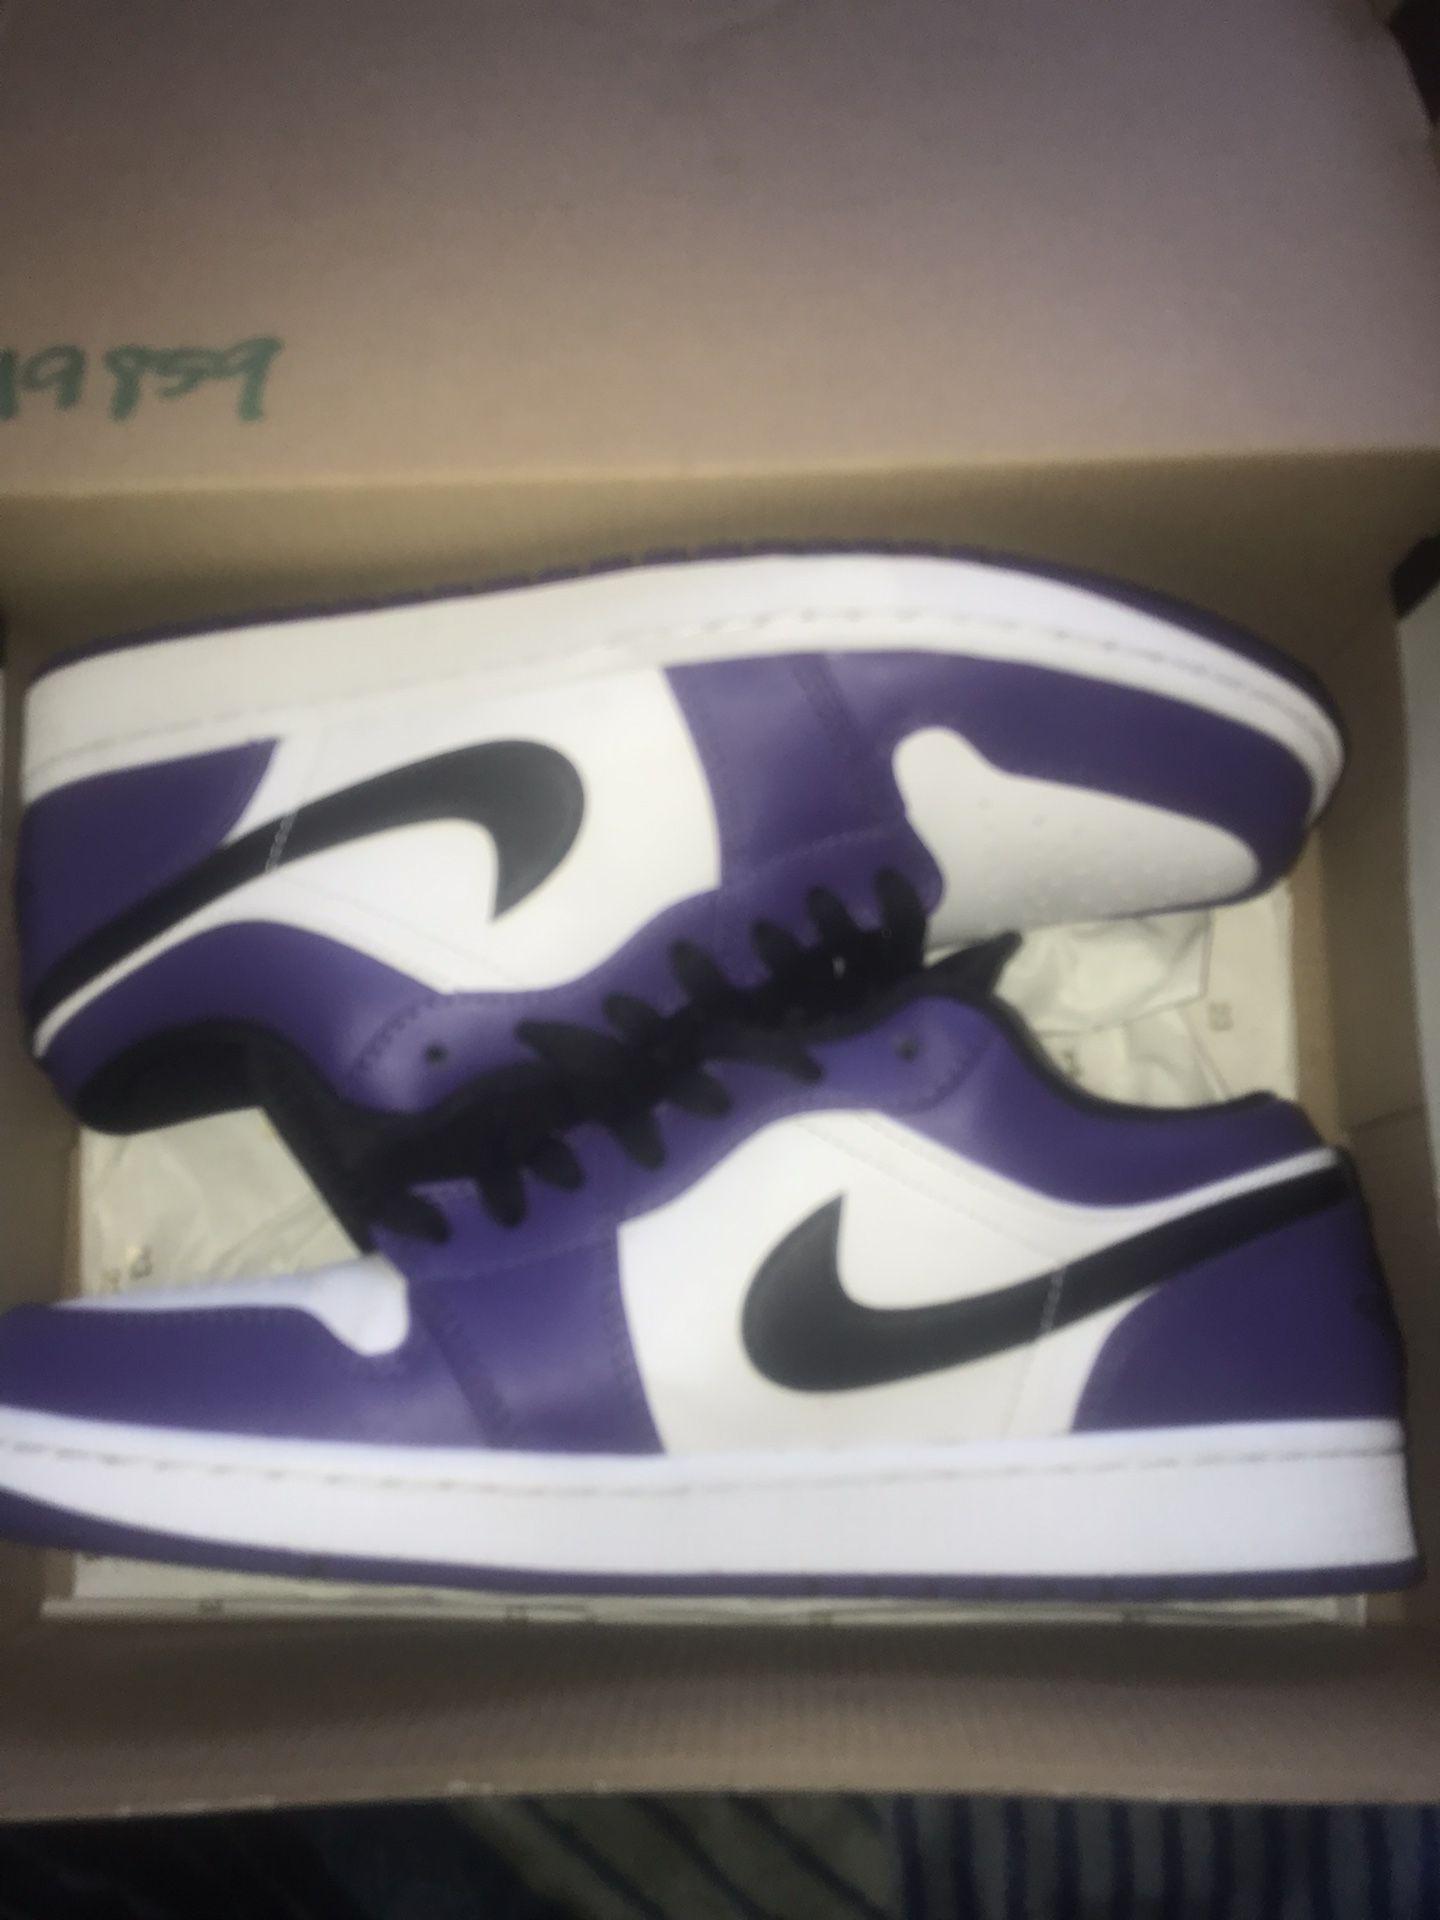 Jordan 1 Court Purple Low Sz 9